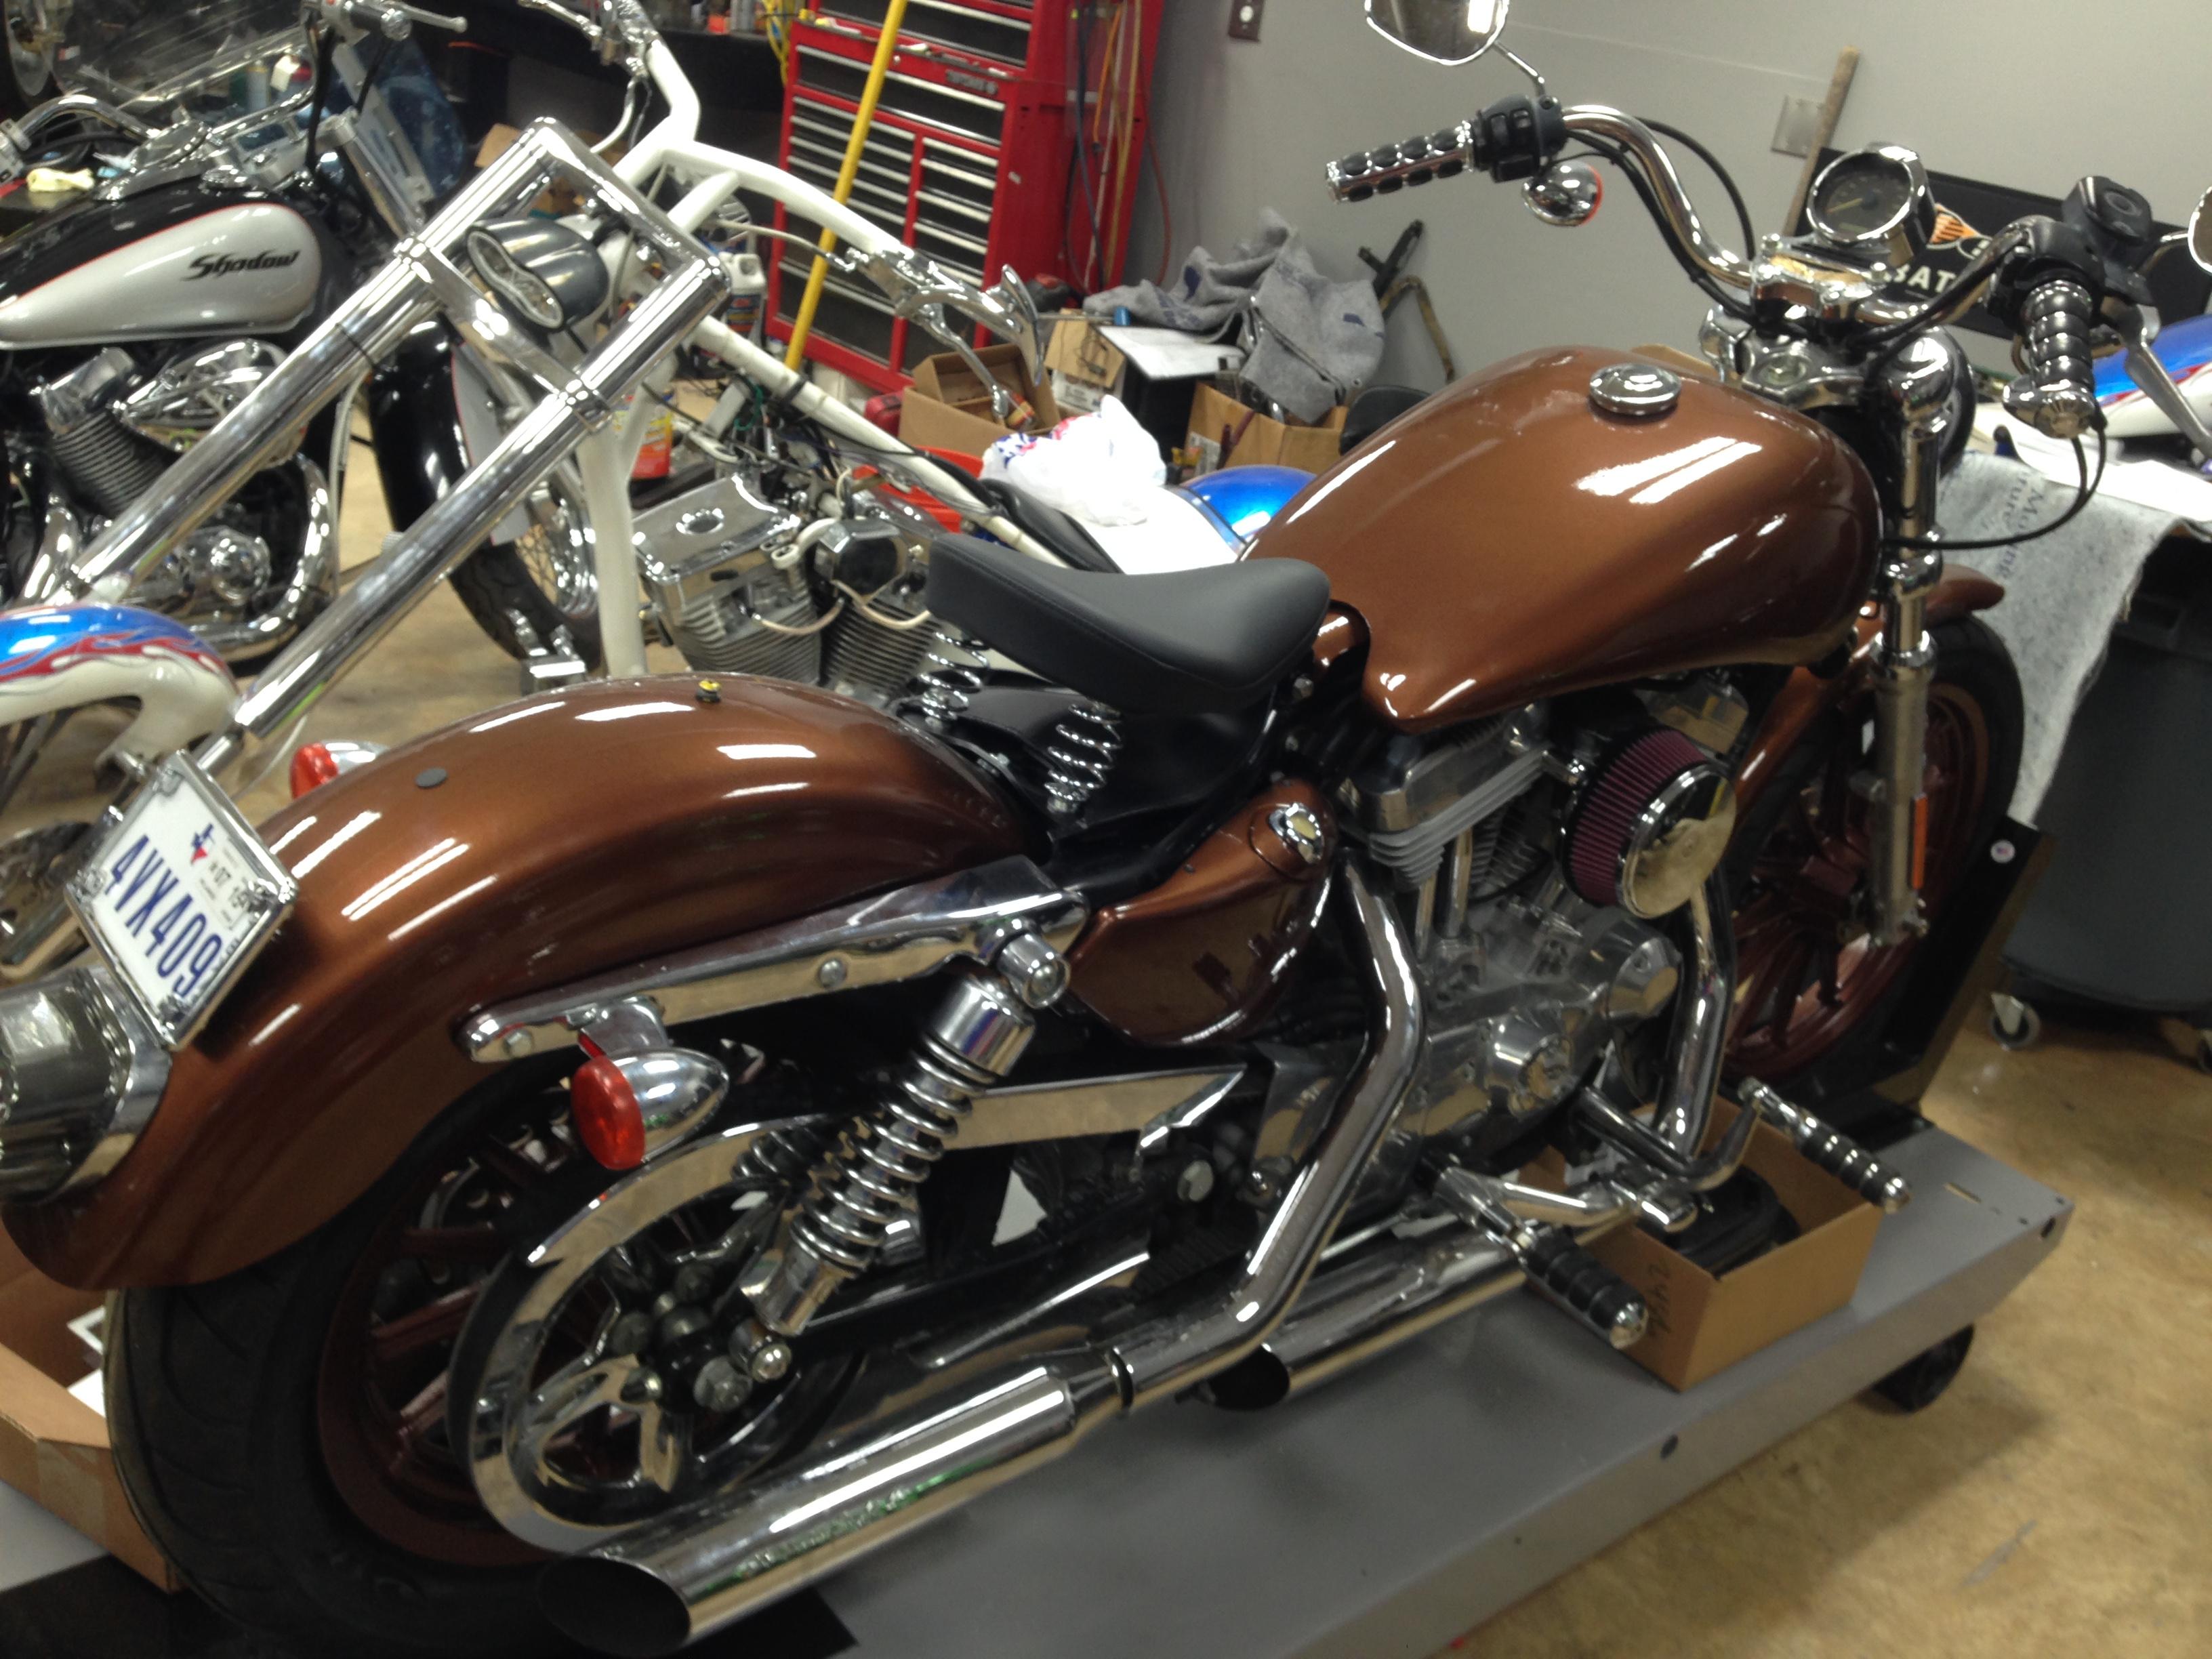 windridge coatings the best way to spray paint a motorcycle frame - Motorcycle Frame Paint